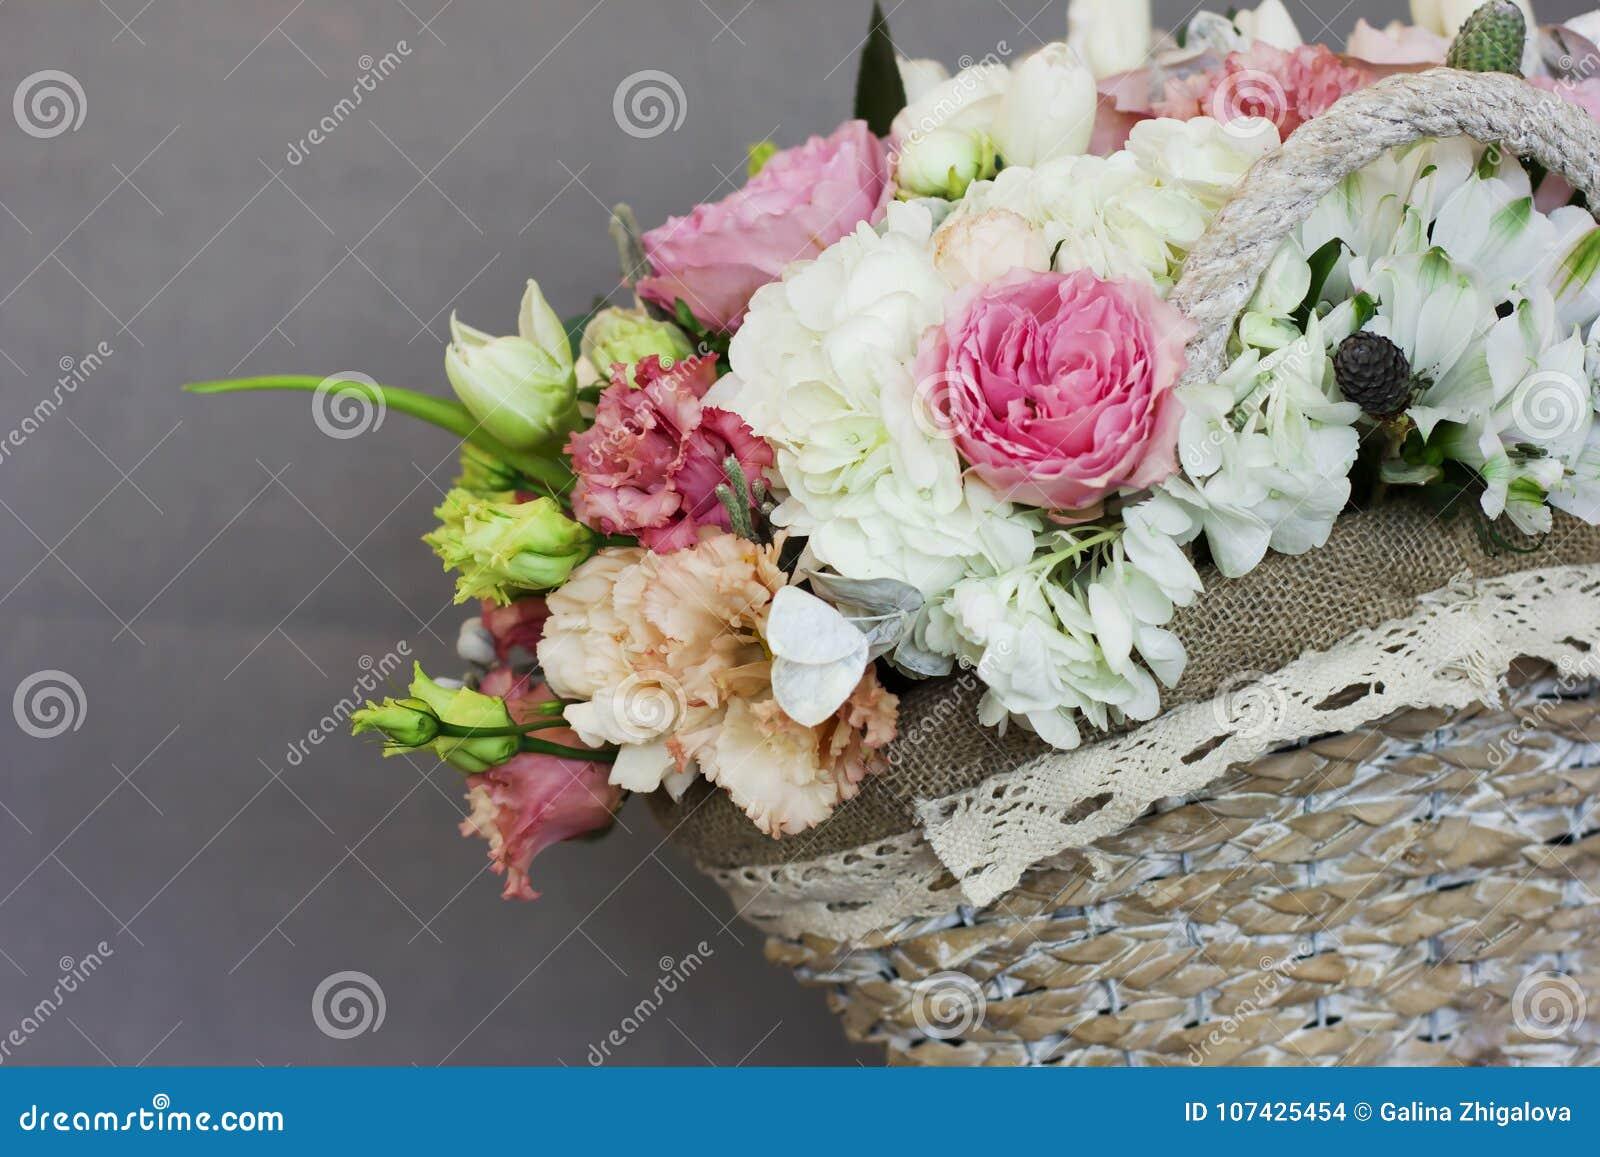 The Beautiful Rustic Bouquet Of Flowers In Wicker Basket Stock Photo ...